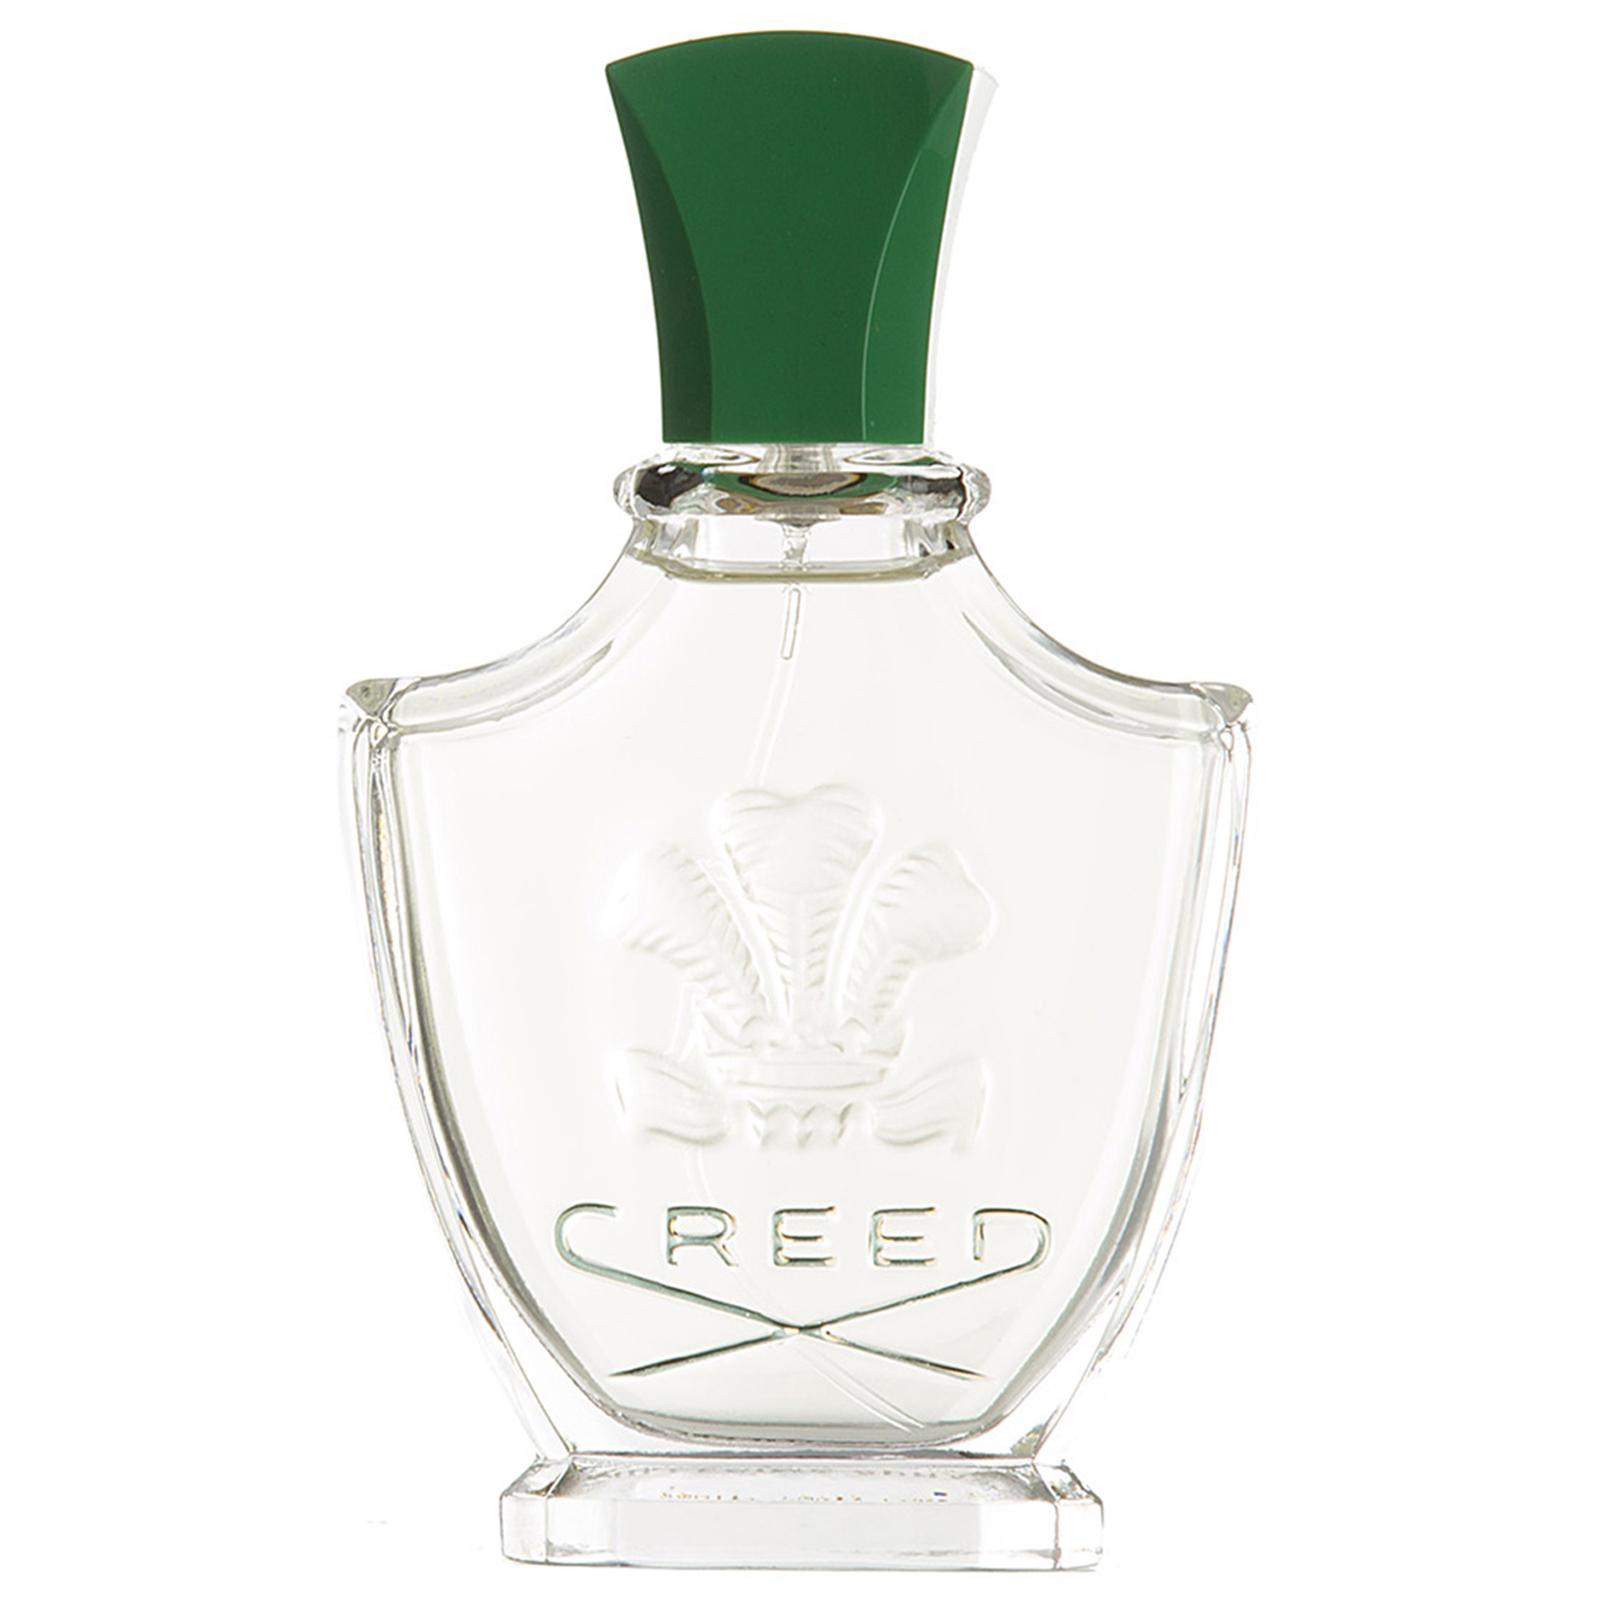 Fleurissimo millésime profumo eau de parfum 75 ml